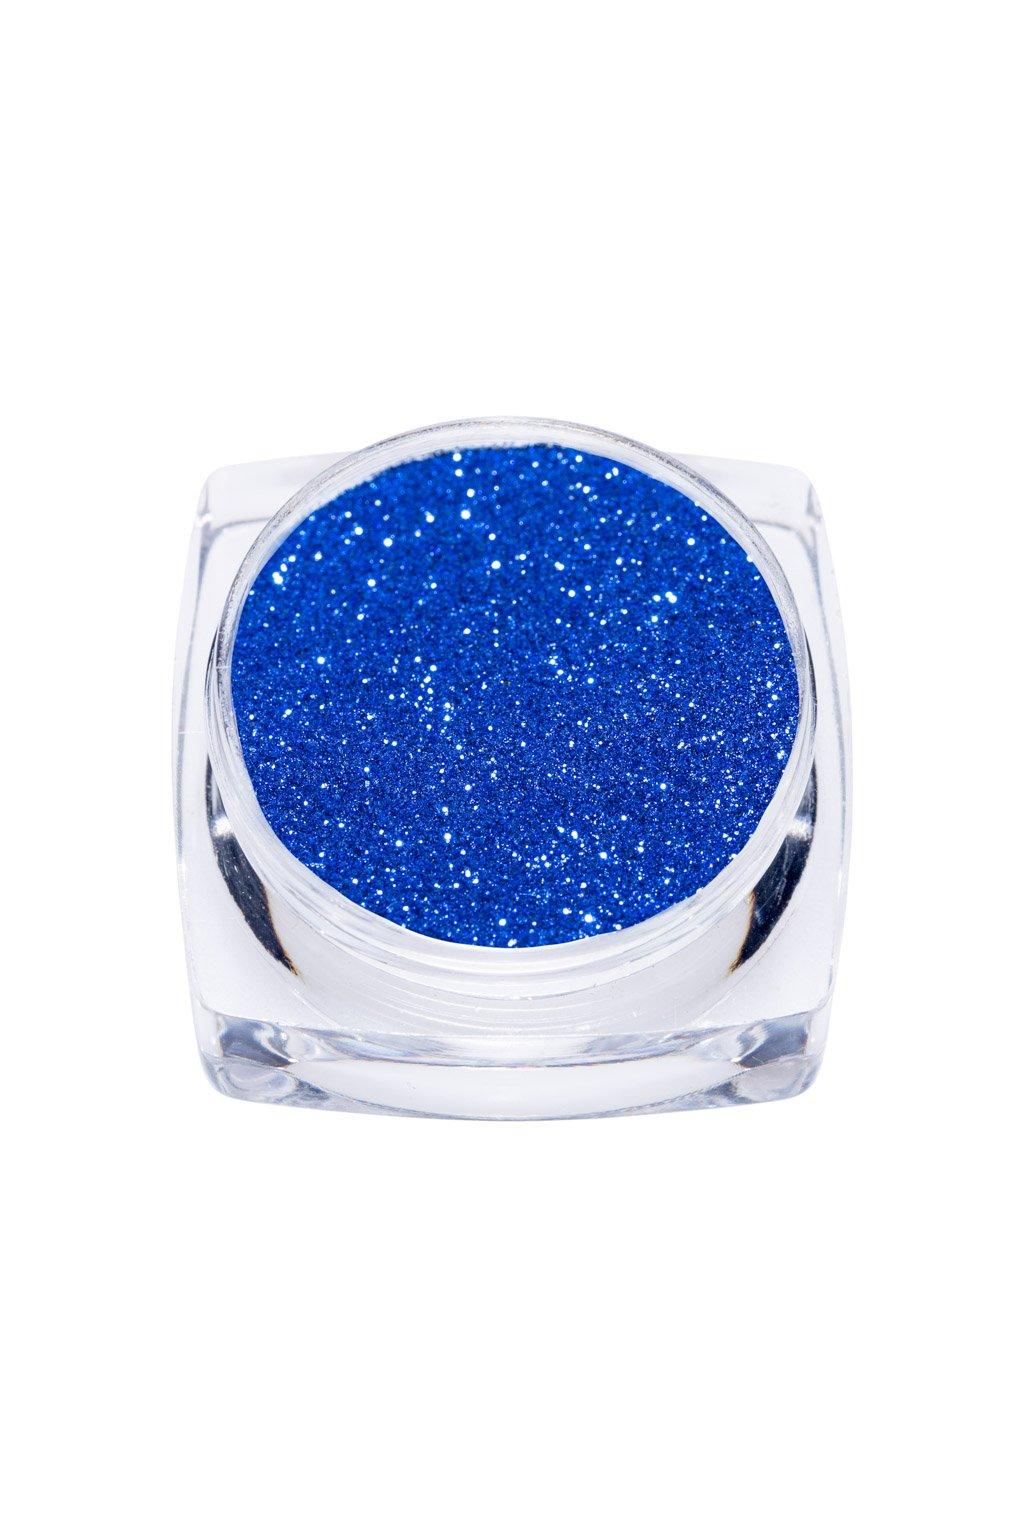 23450 trpyt navy blue